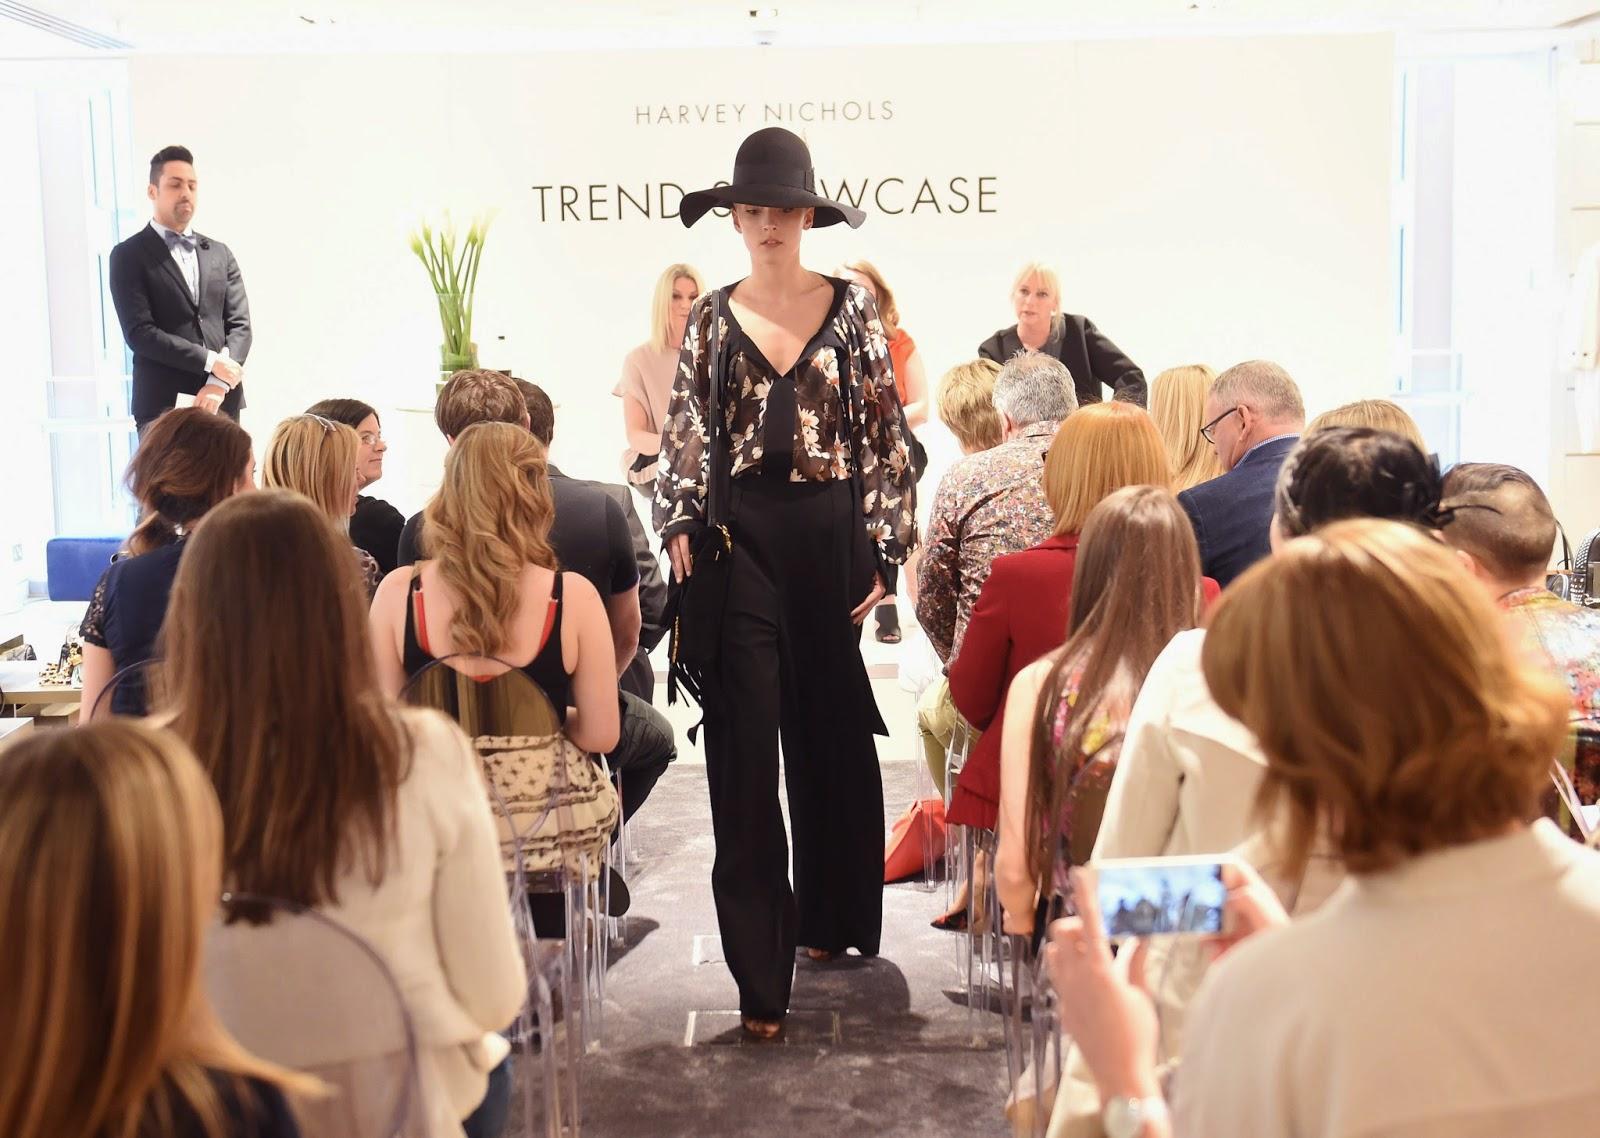 Harvey Nichols Trends Showcase